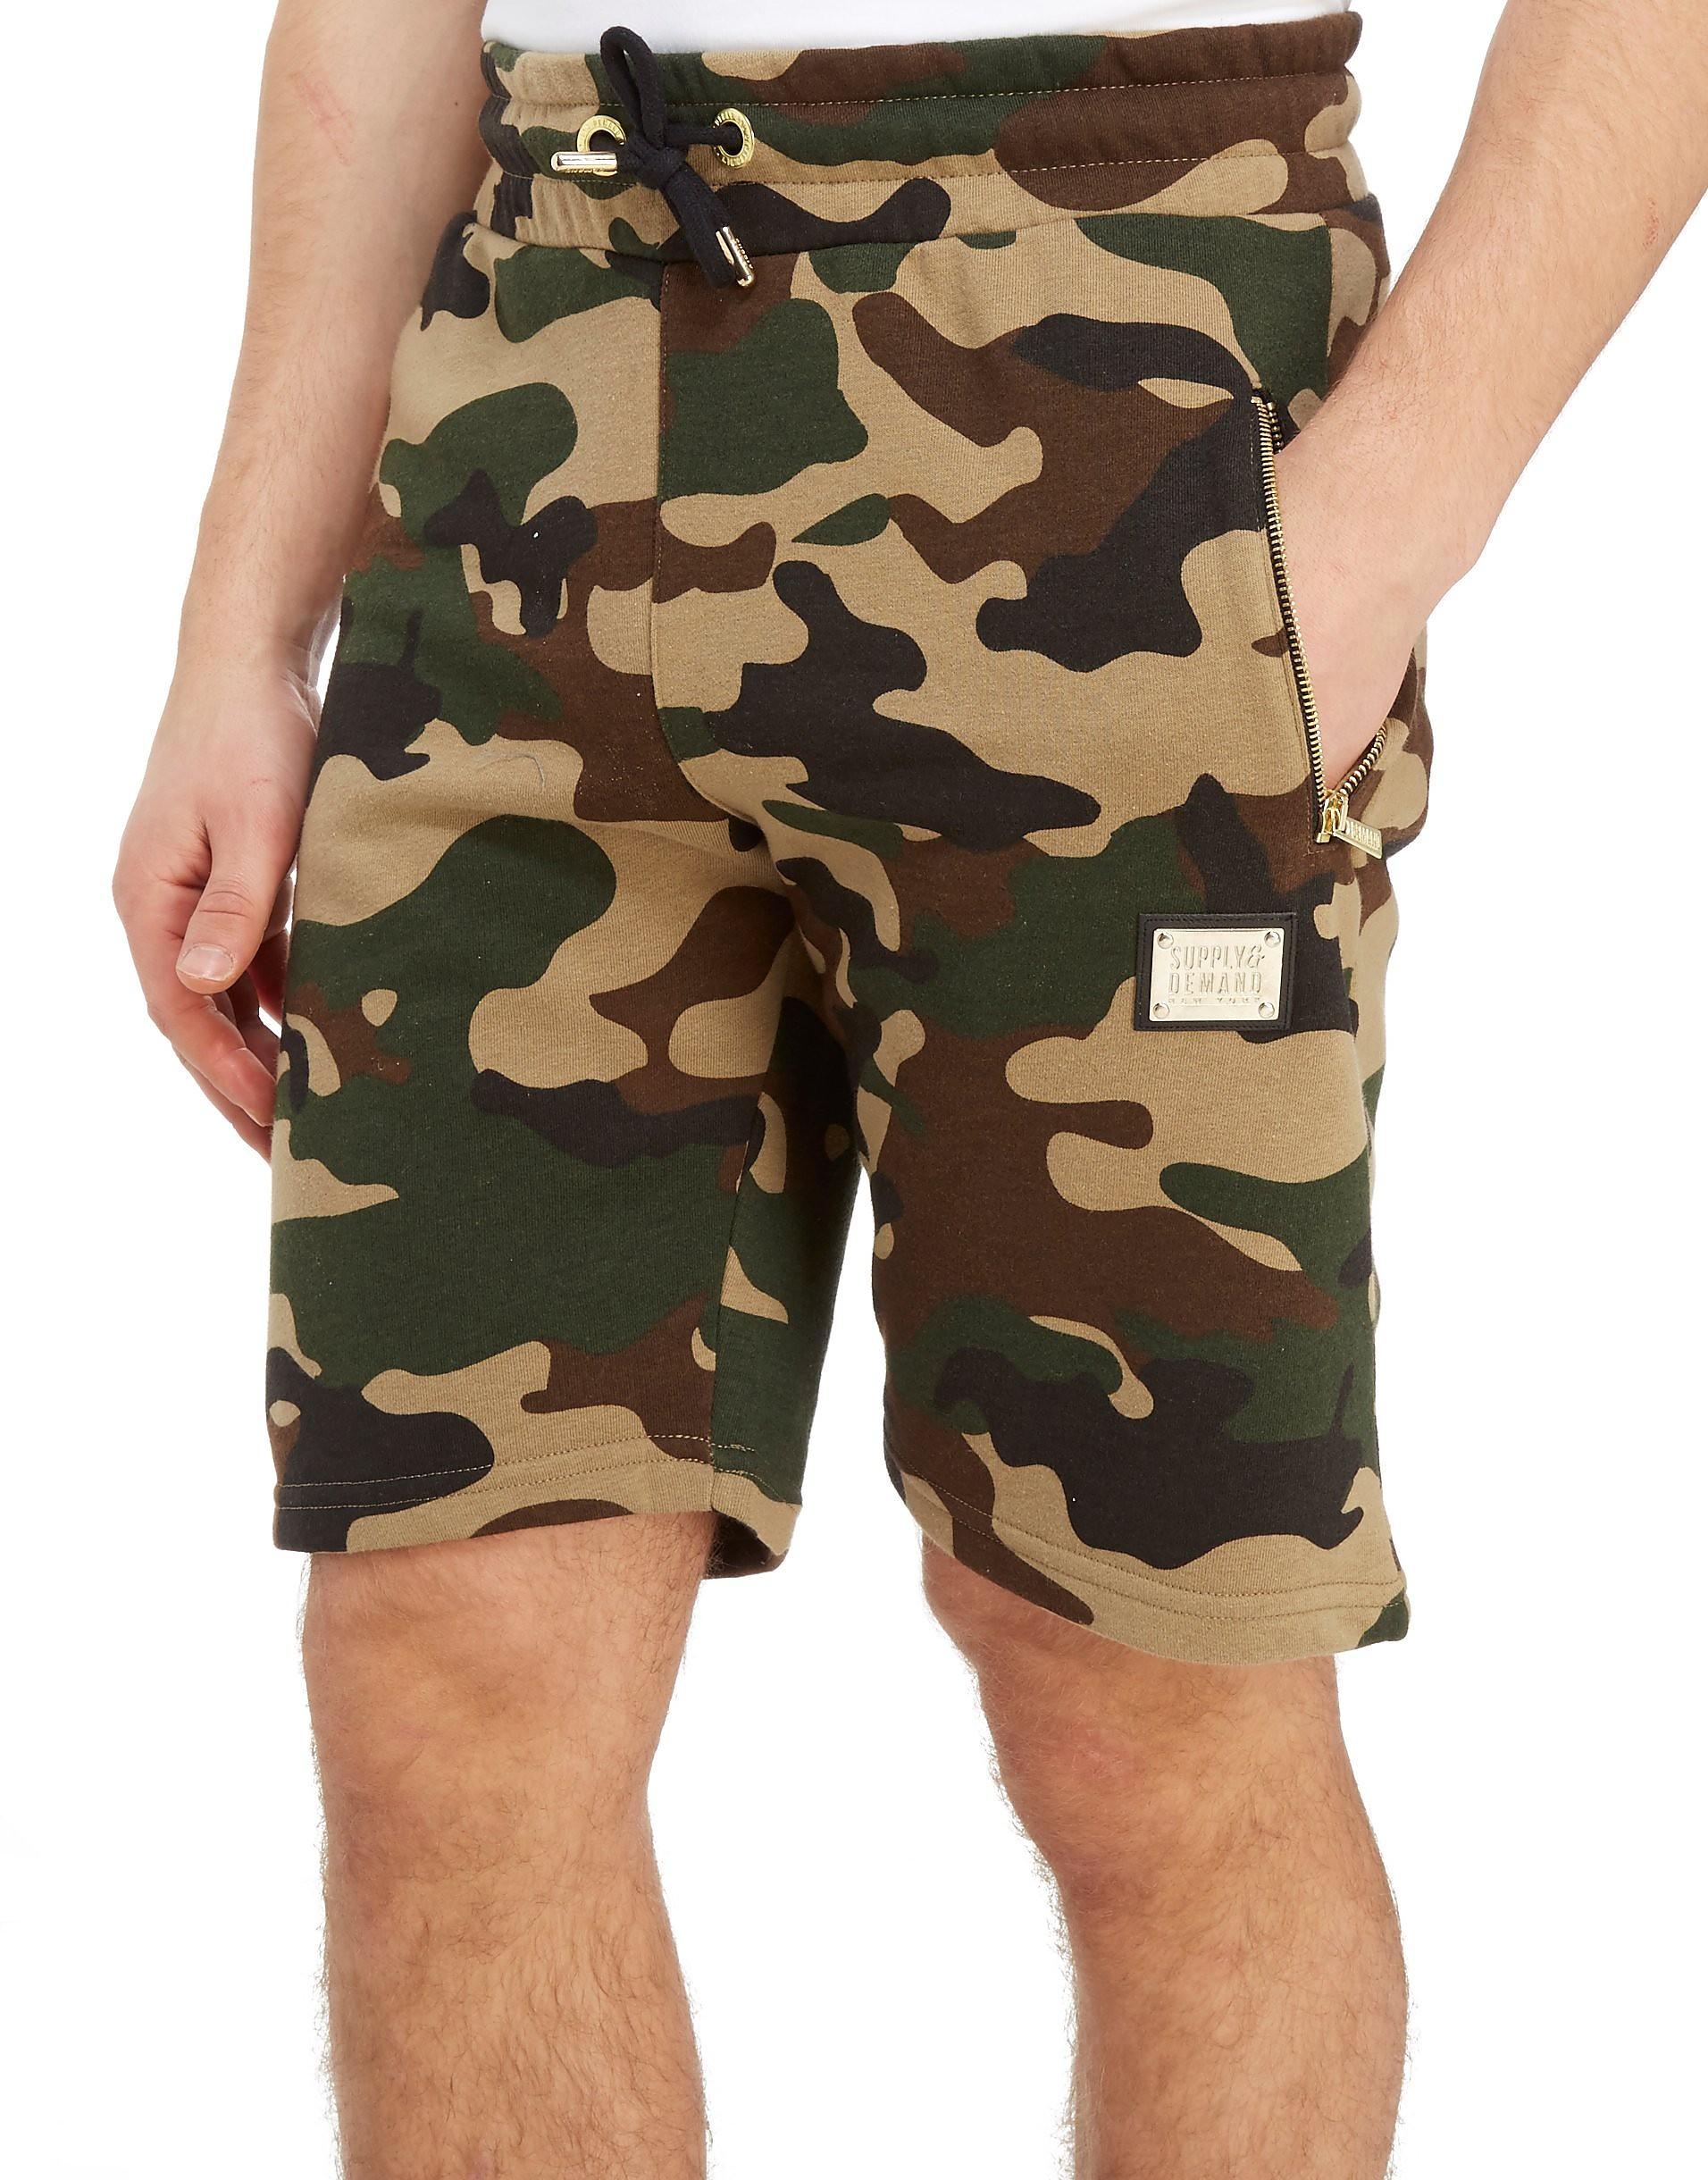 Supply & Demand pantalón corto Nova Loop